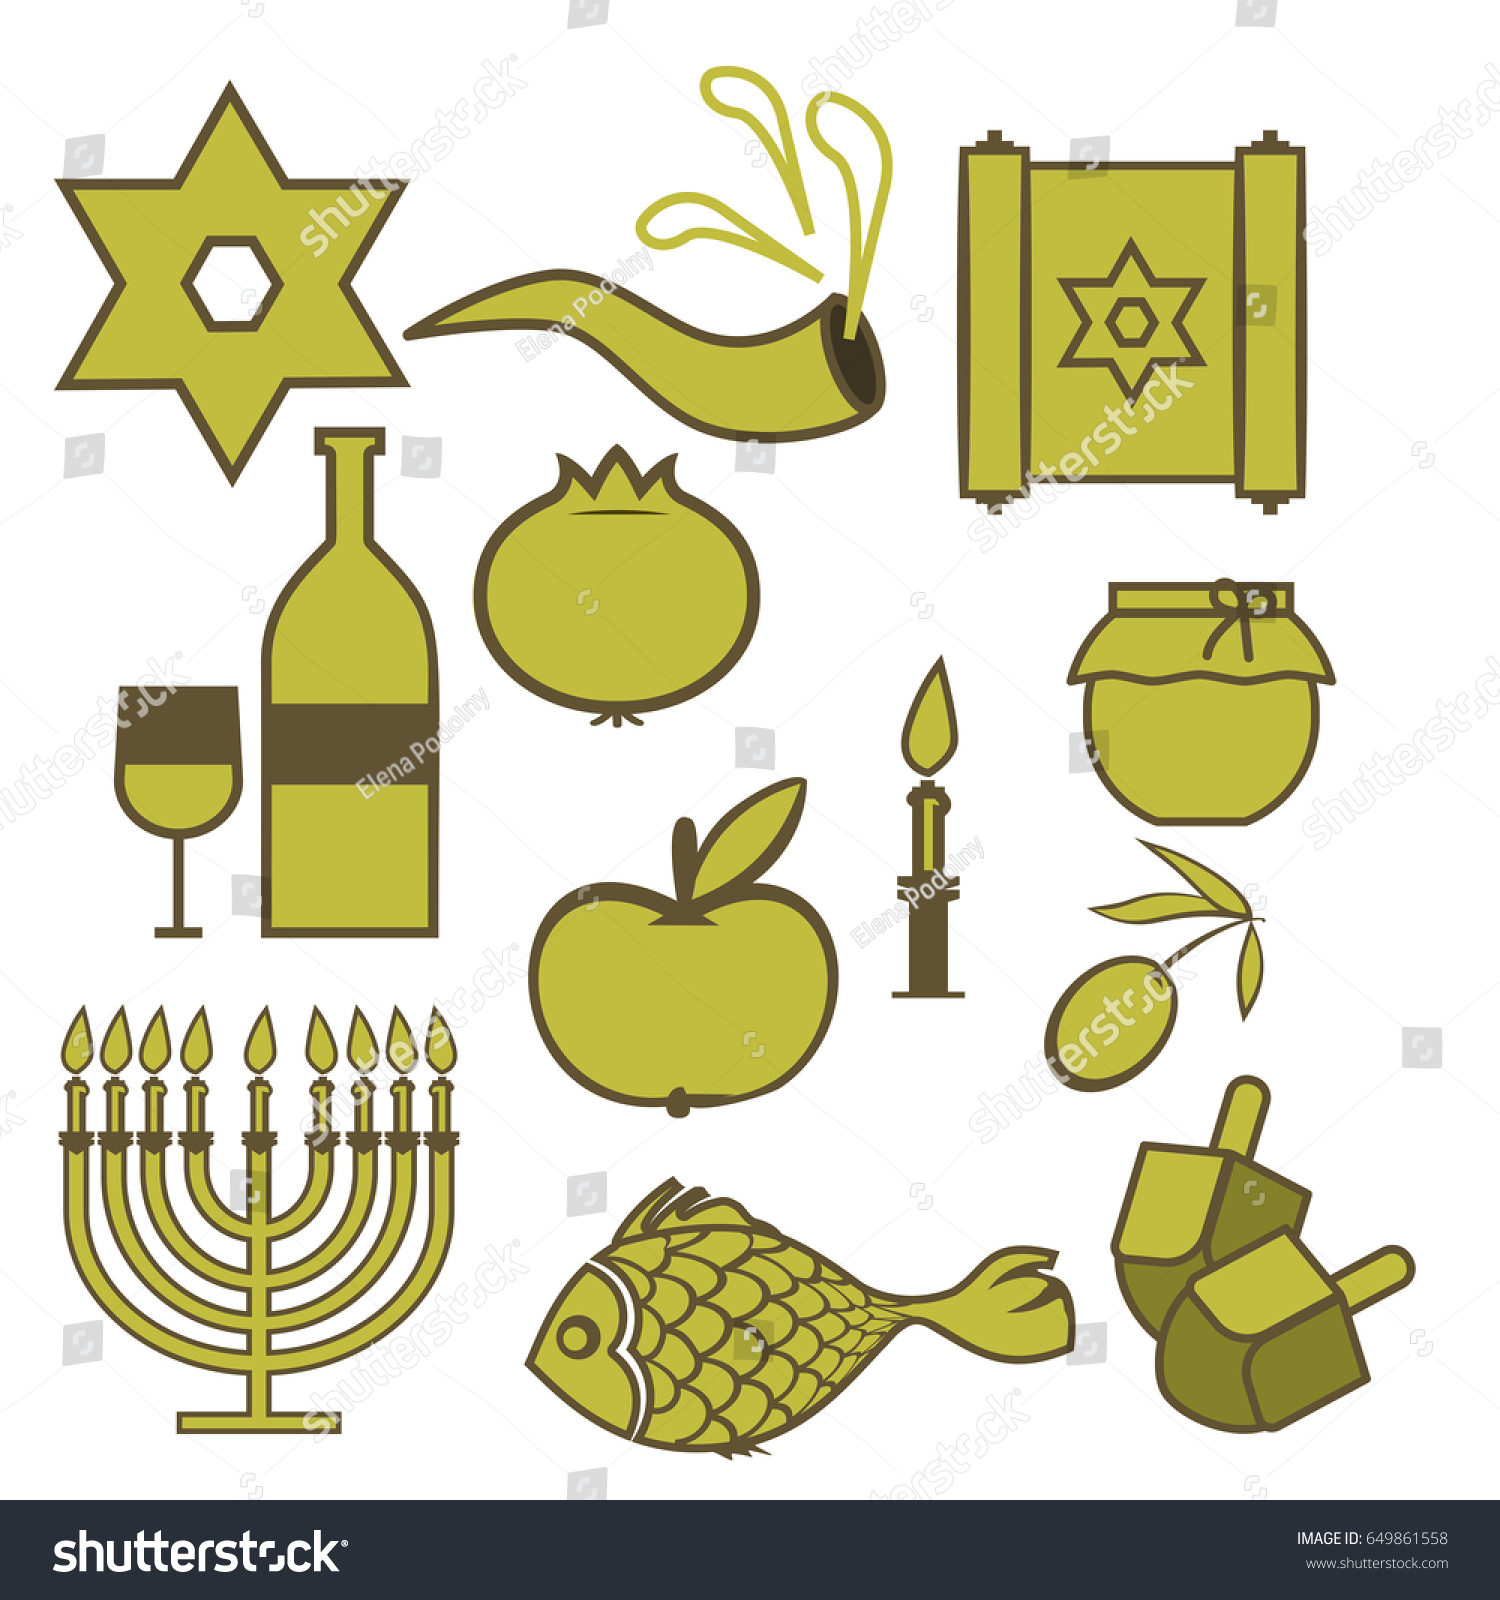 Set traditional hebrew symbols isolated symbols stock vector set of traditional hebrew symbols isolated symbols of jewish holidays on a white background biocorpaavc